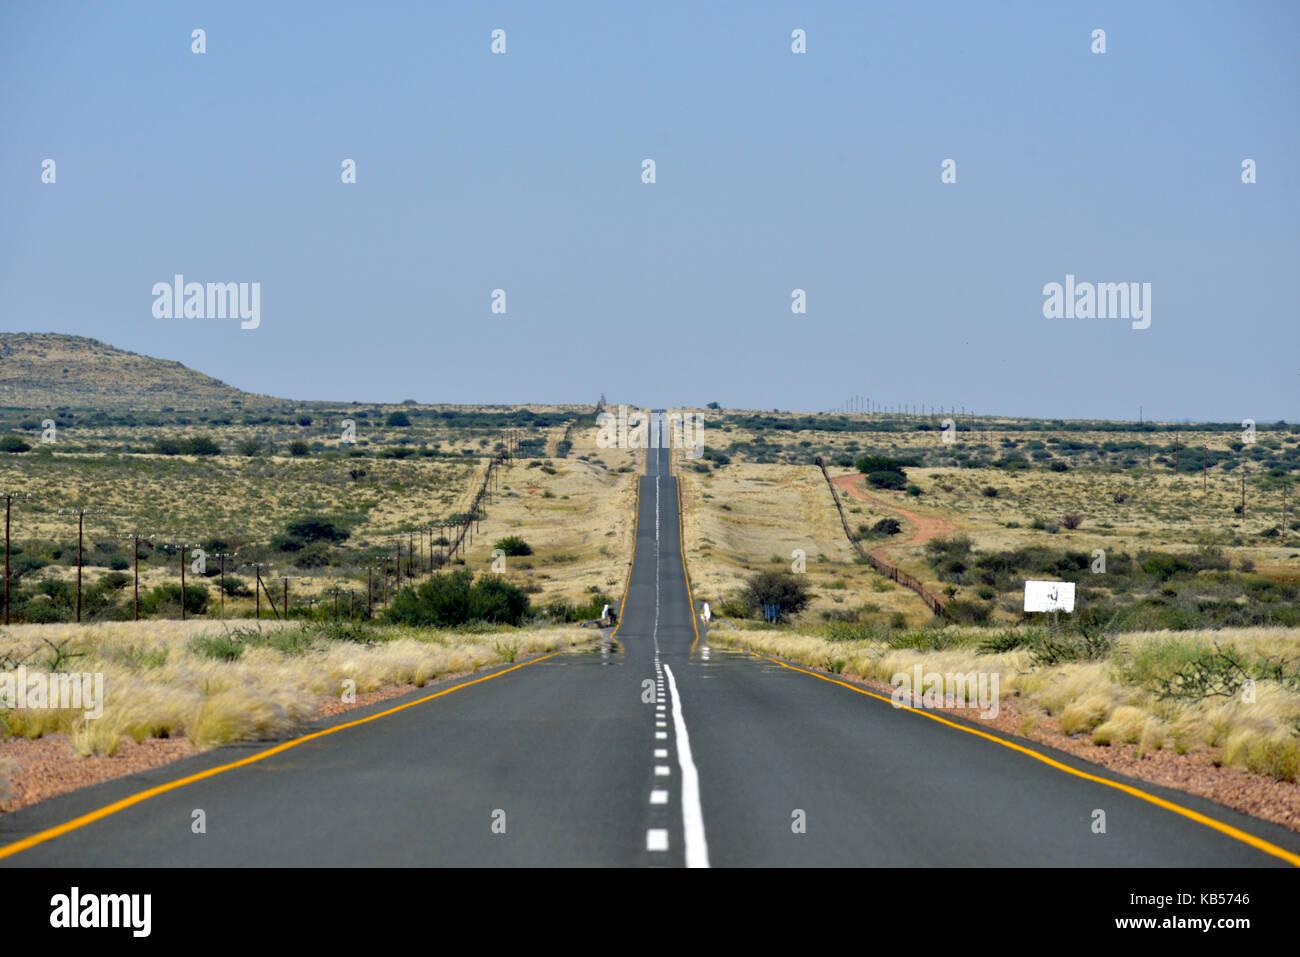 Namibia, Kalahari desert, road - Stock Image